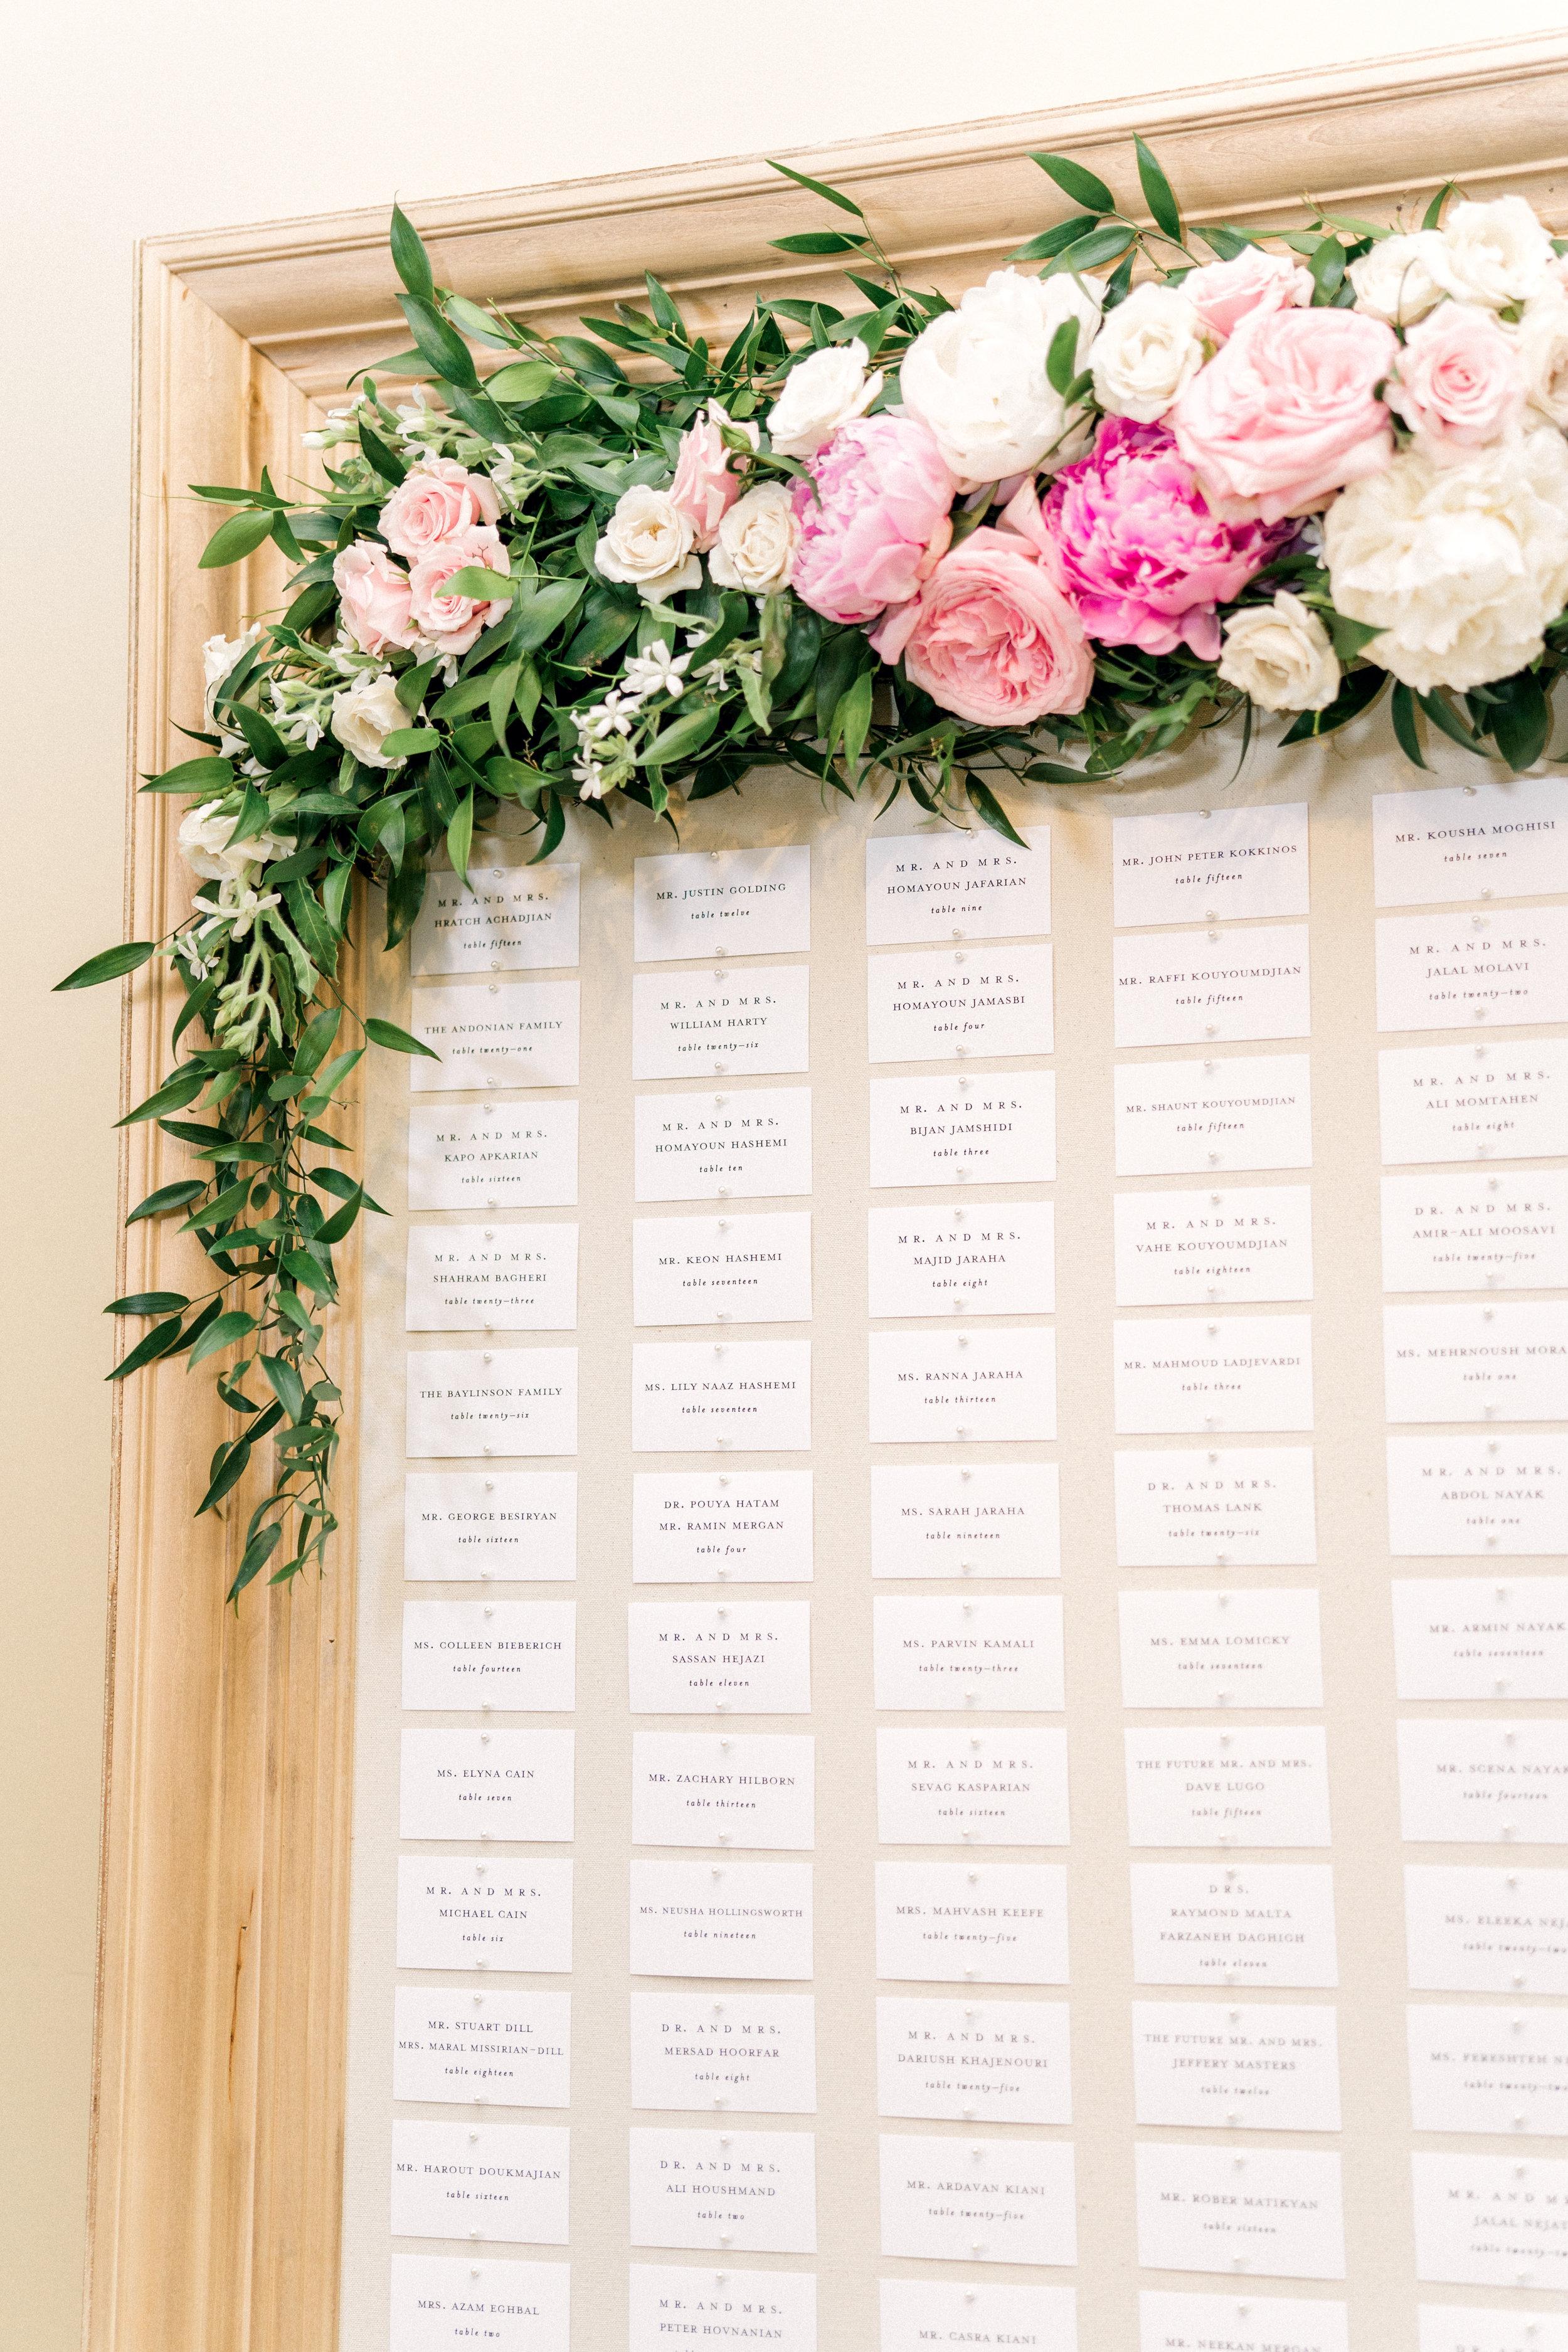 Courtney Inghram Stone Tower Winery Leesburg Virginia Wedding Florist